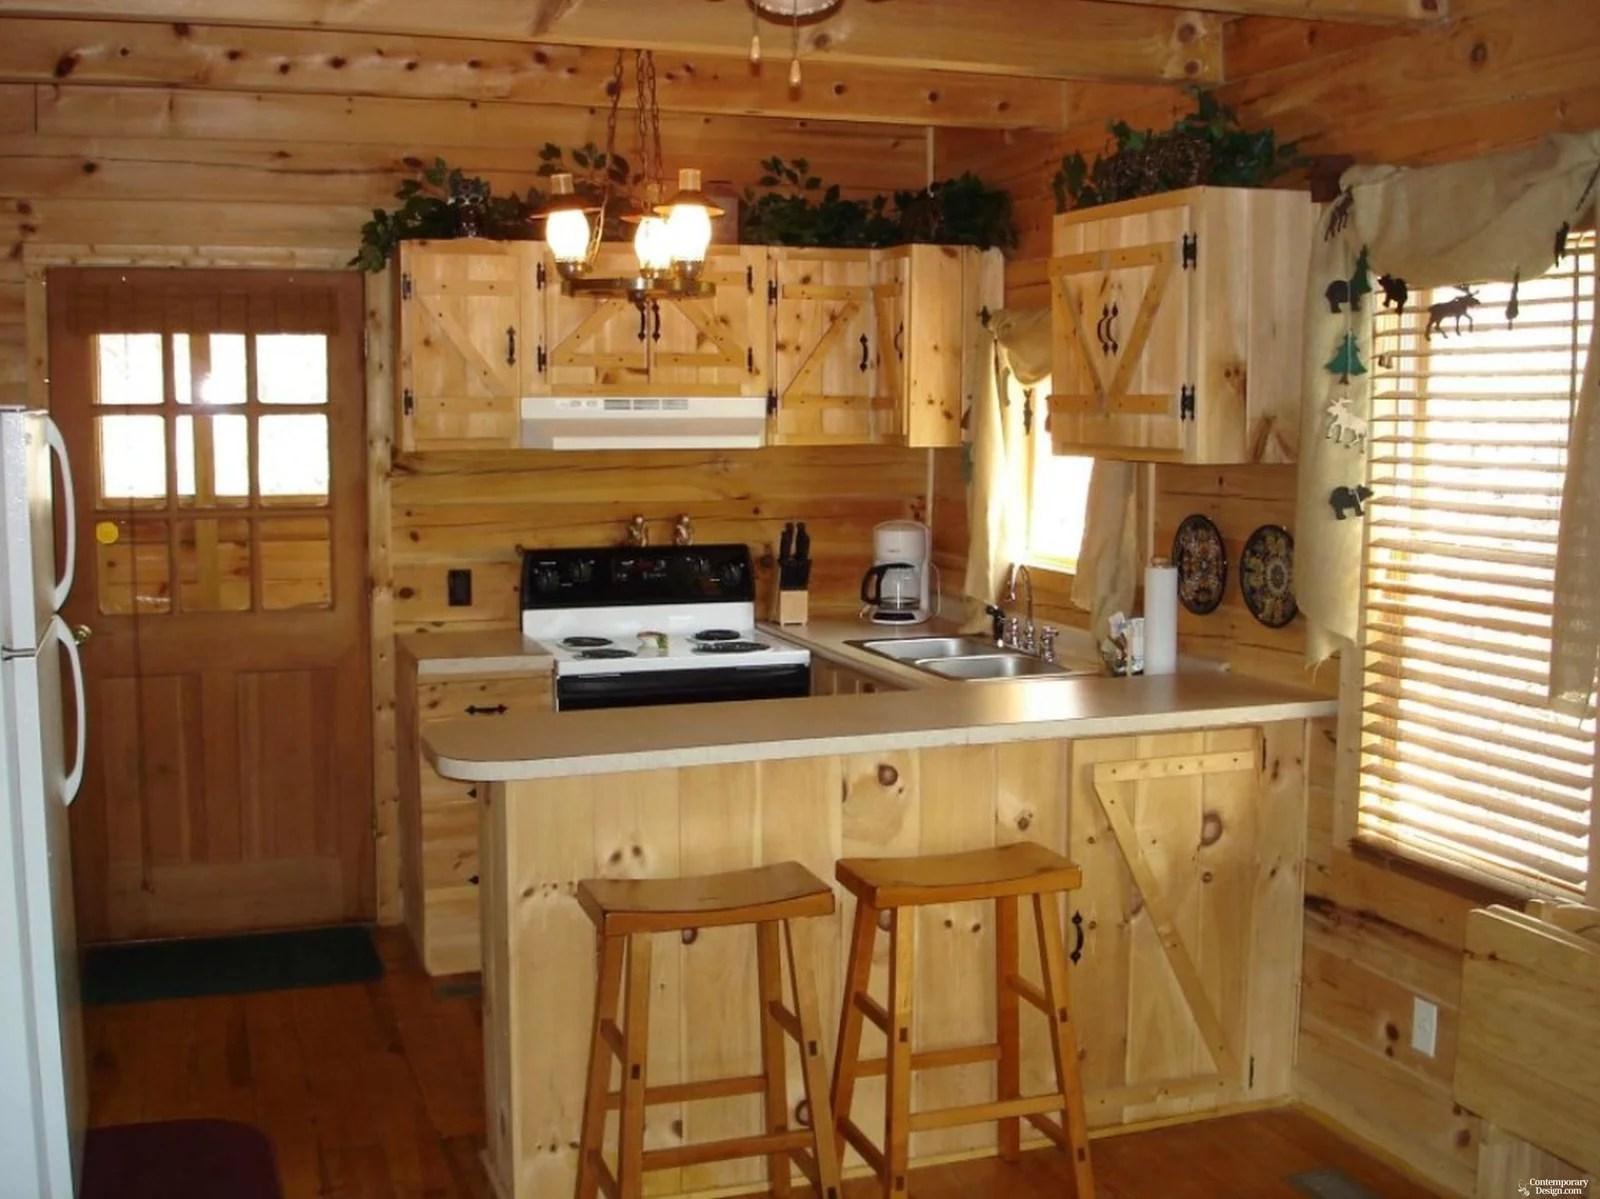 1465403086 charming ideas cottage style kitchen design country kitchen small country cottage kitchen ideas small country cottage kitchens